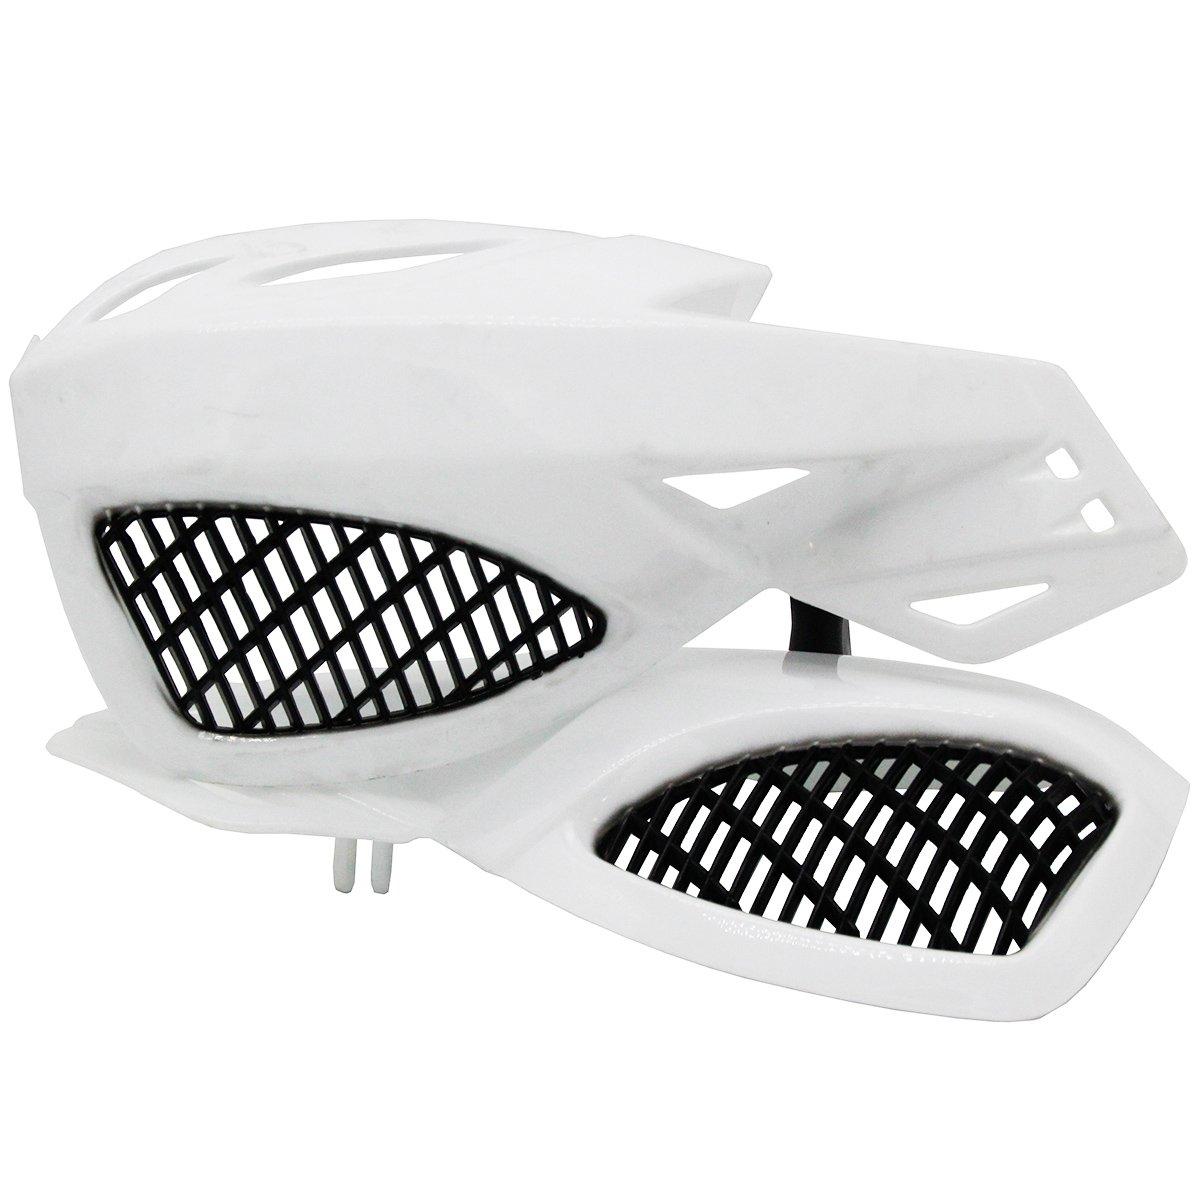 Lozom 7/8'' Motorcycle Handguards Handlebar Hand Guards Brush Bar Protector For Motocross Supermoto Racing Dirt Bike ATV (White)